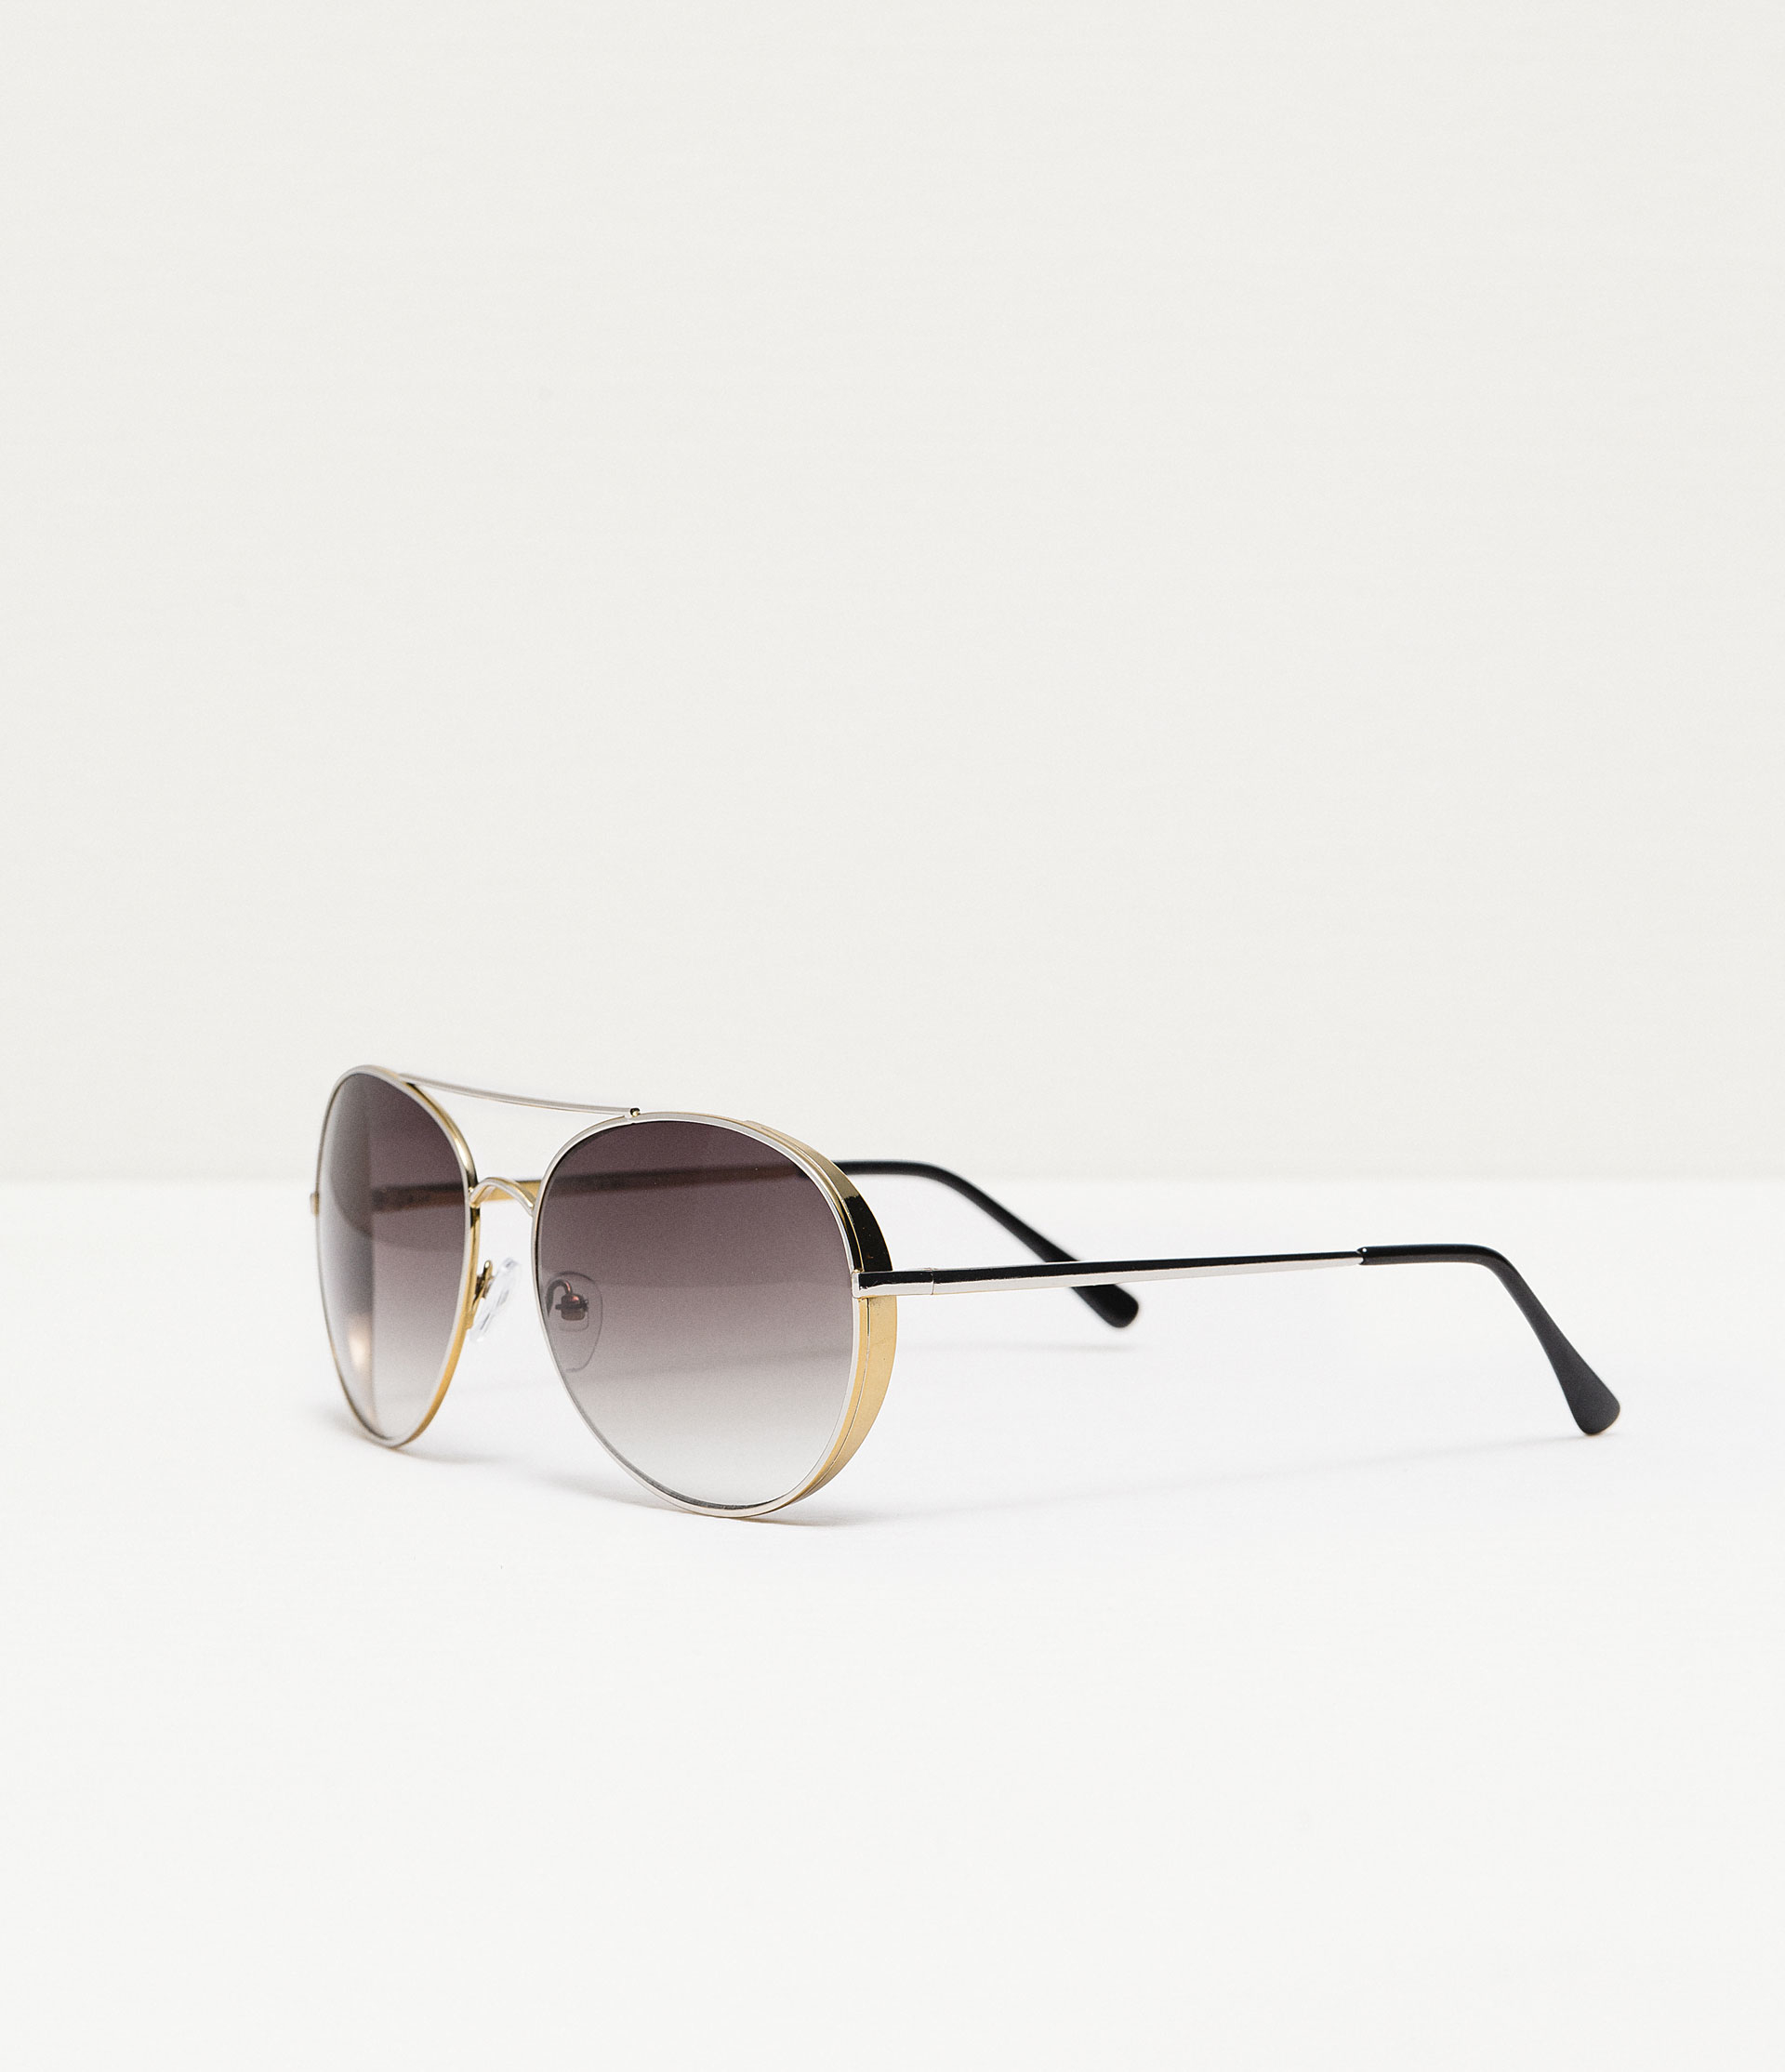 Vintage Aviator Sunglasses 35